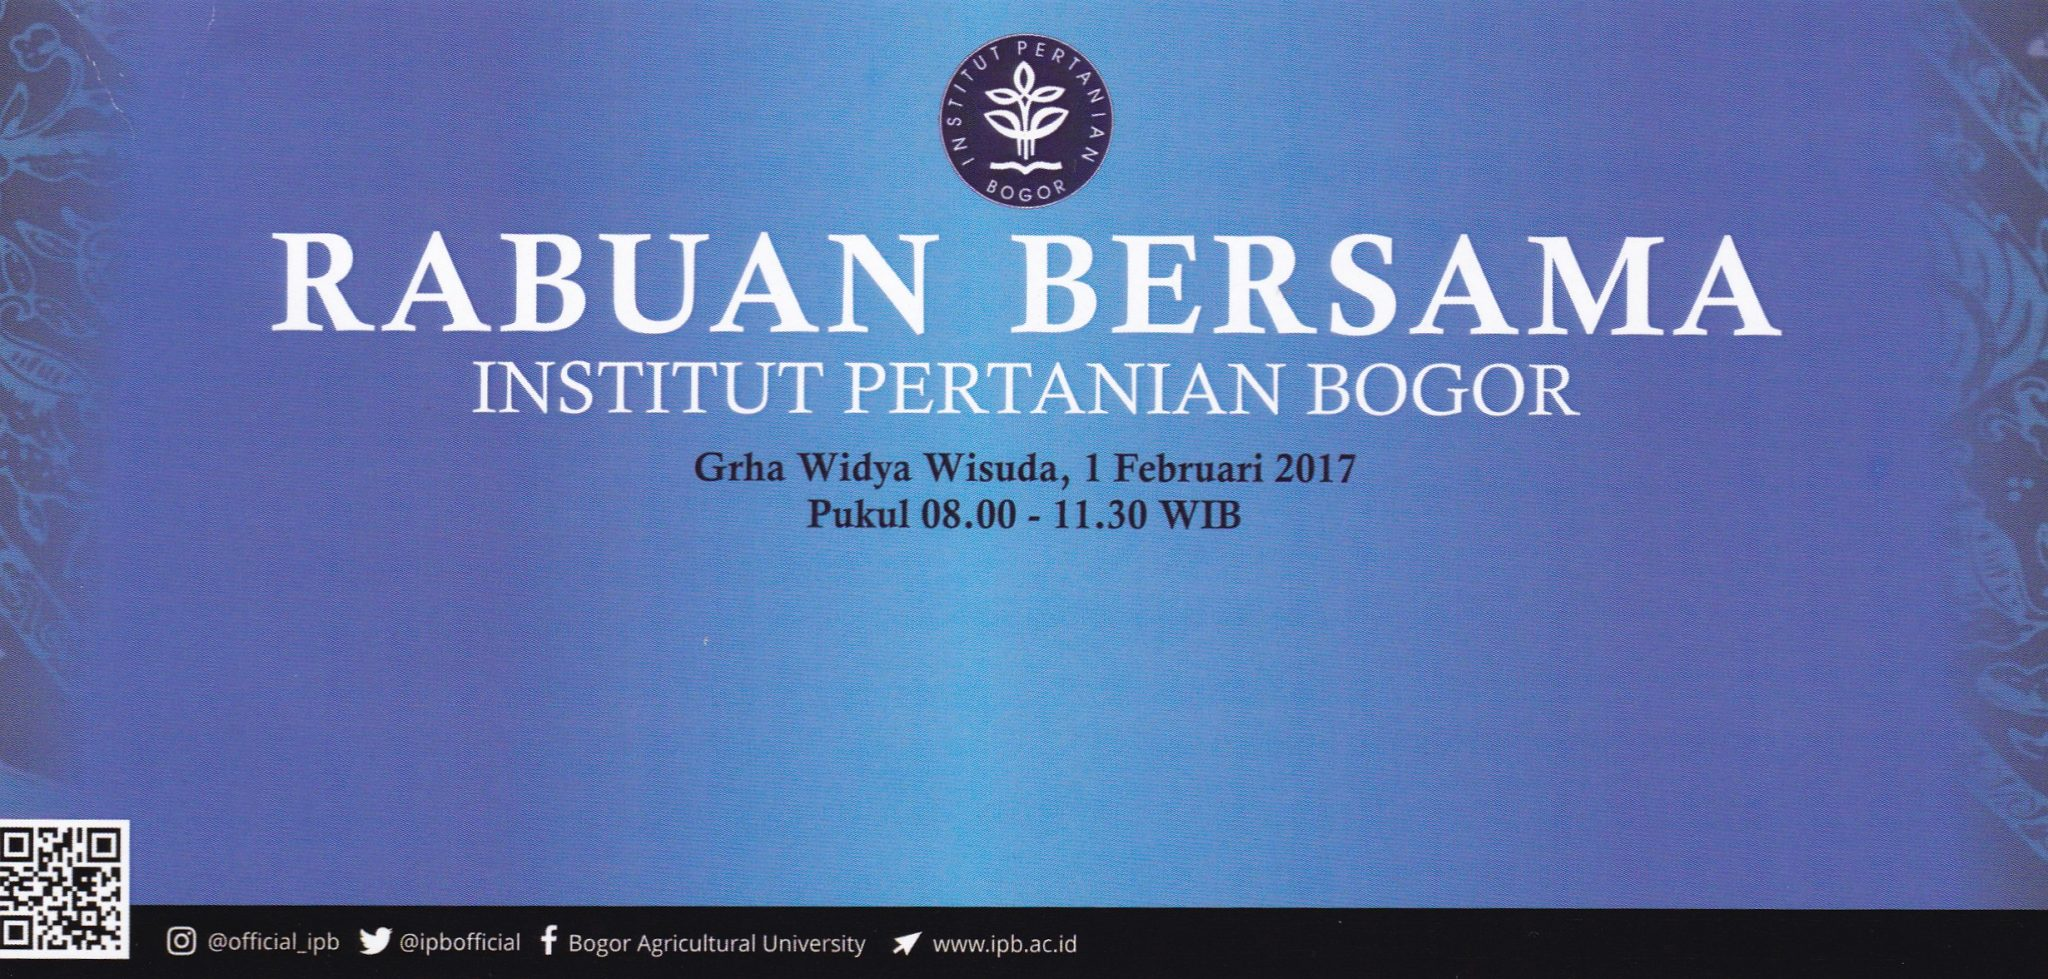 Undangan Rabuan Bersama Warga IPB Rabu, 1 Februari 2017 – Prof. Dr. Ir. H. Herry Suhardiyanto, M.Sc (Rektor Institut Pertanian Bogor) mengundang seluruh warga IPB, baik itu pegawai berstatus PNS maupun non-PNS untuk mengikuti rabuan bersama yang dilaksanakan di Gedung Graha Widya Wisuda (GWW), Kampus IPB Darmaga - Bogor.